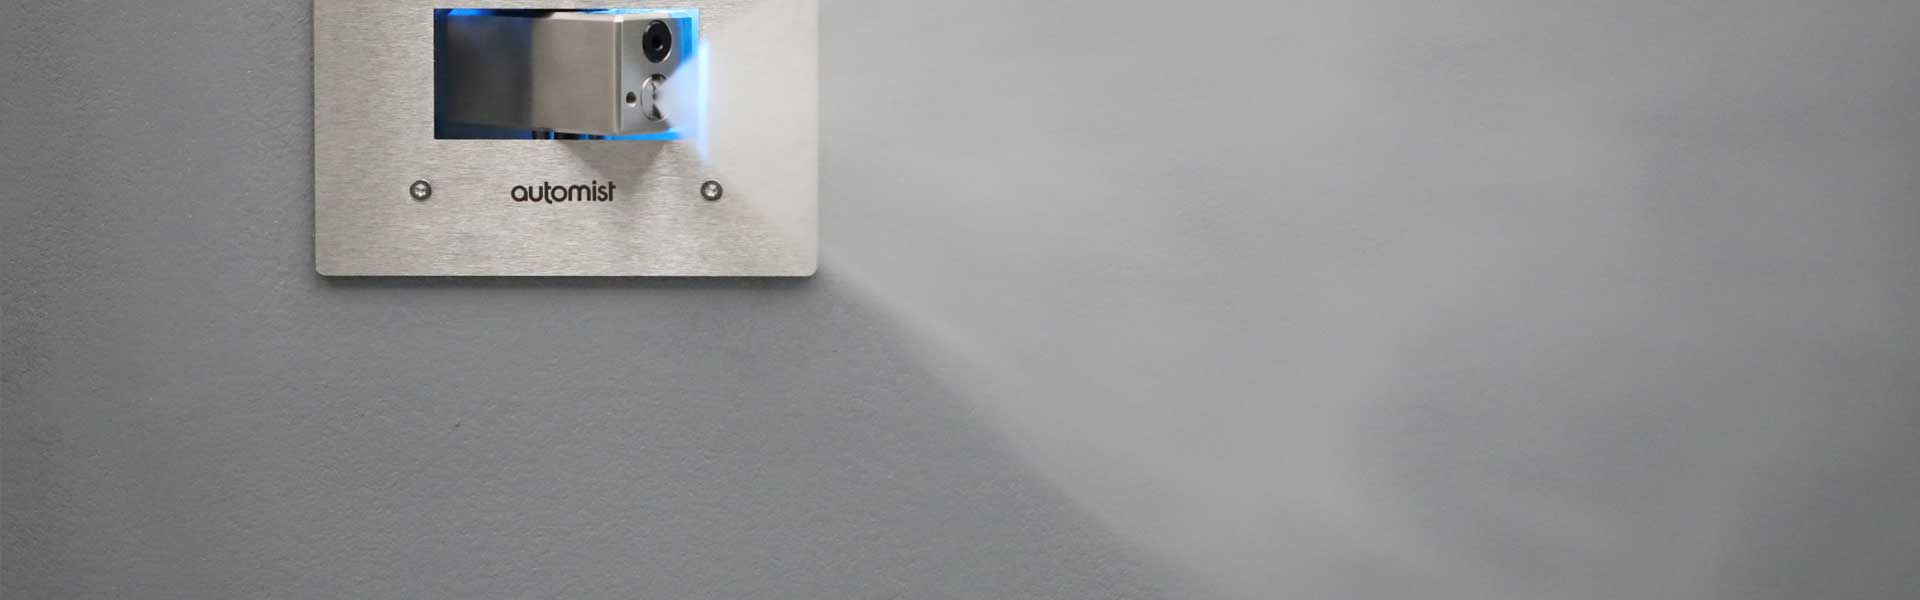 Domestic water mist fire sprinkler system